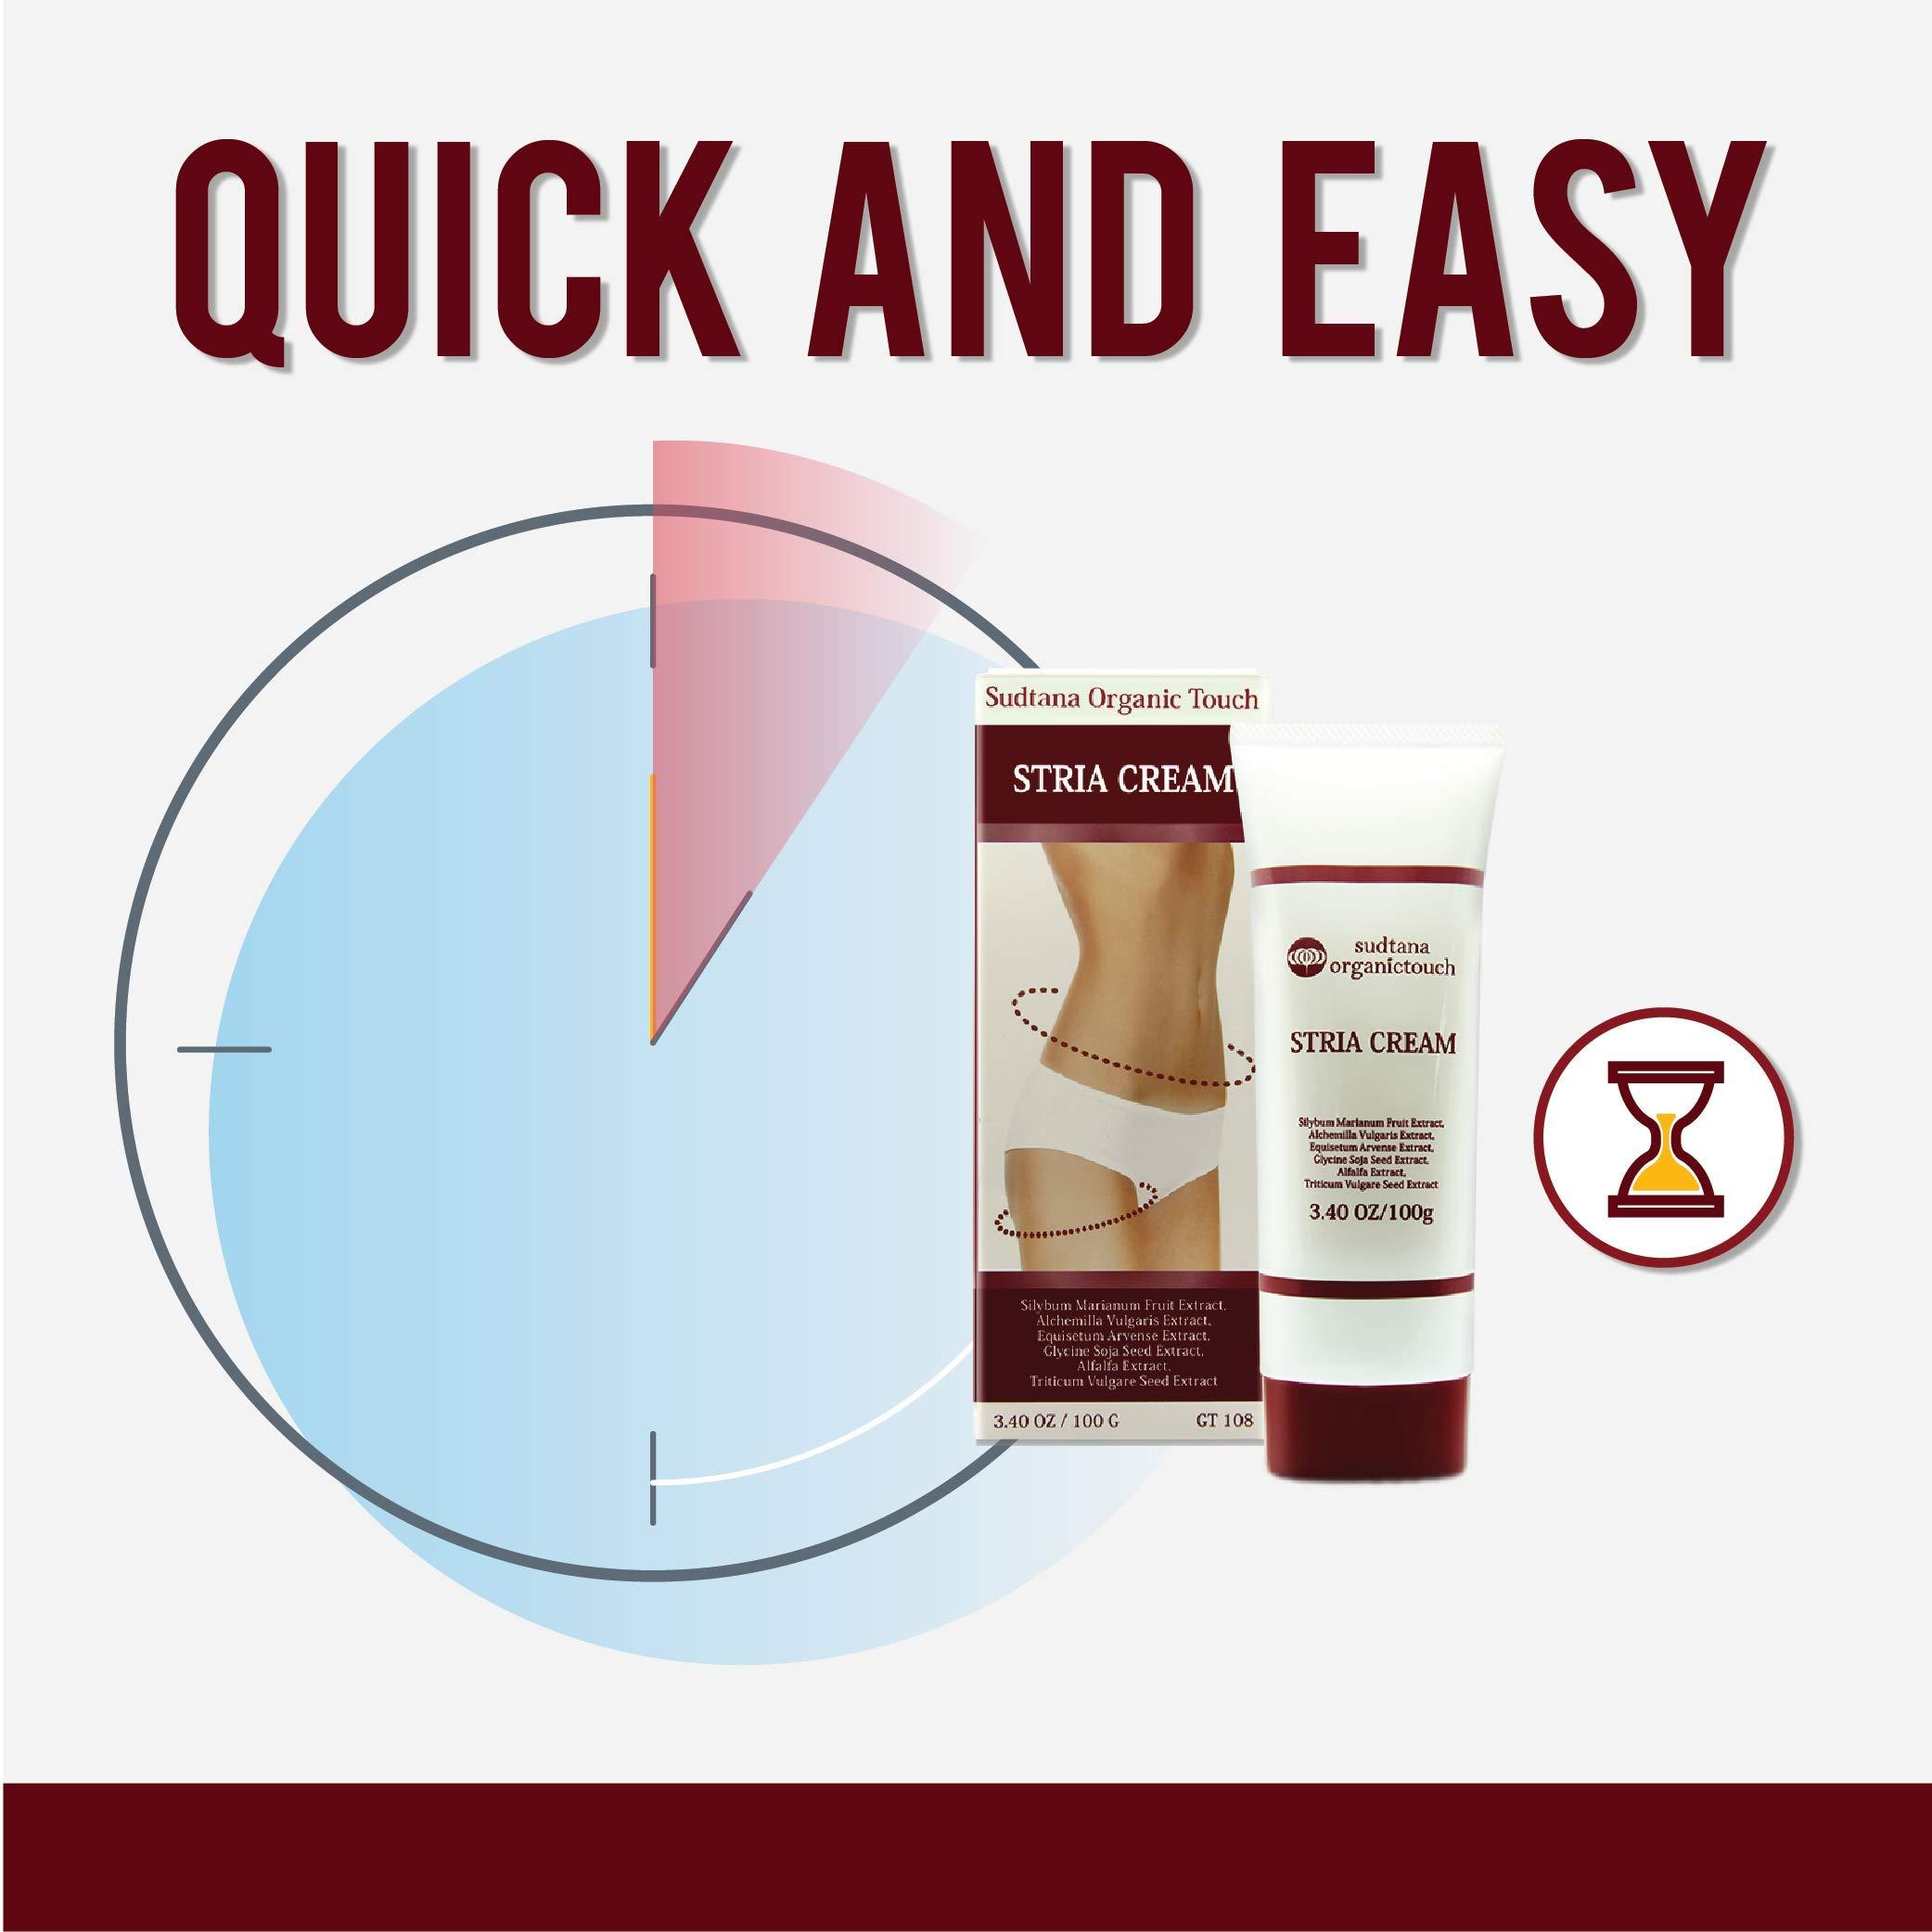 STRIA Natural Stretch Marks, Scar & Dark Spot Remover   Stretch Mark Cream for Skin Hydration, Exfoliation, Tightening & Collagen Boost   Pregnancy Belly Care for Prenatal-Postnatal & Pregnant   3 pcs by GreenTouch (Image #8)